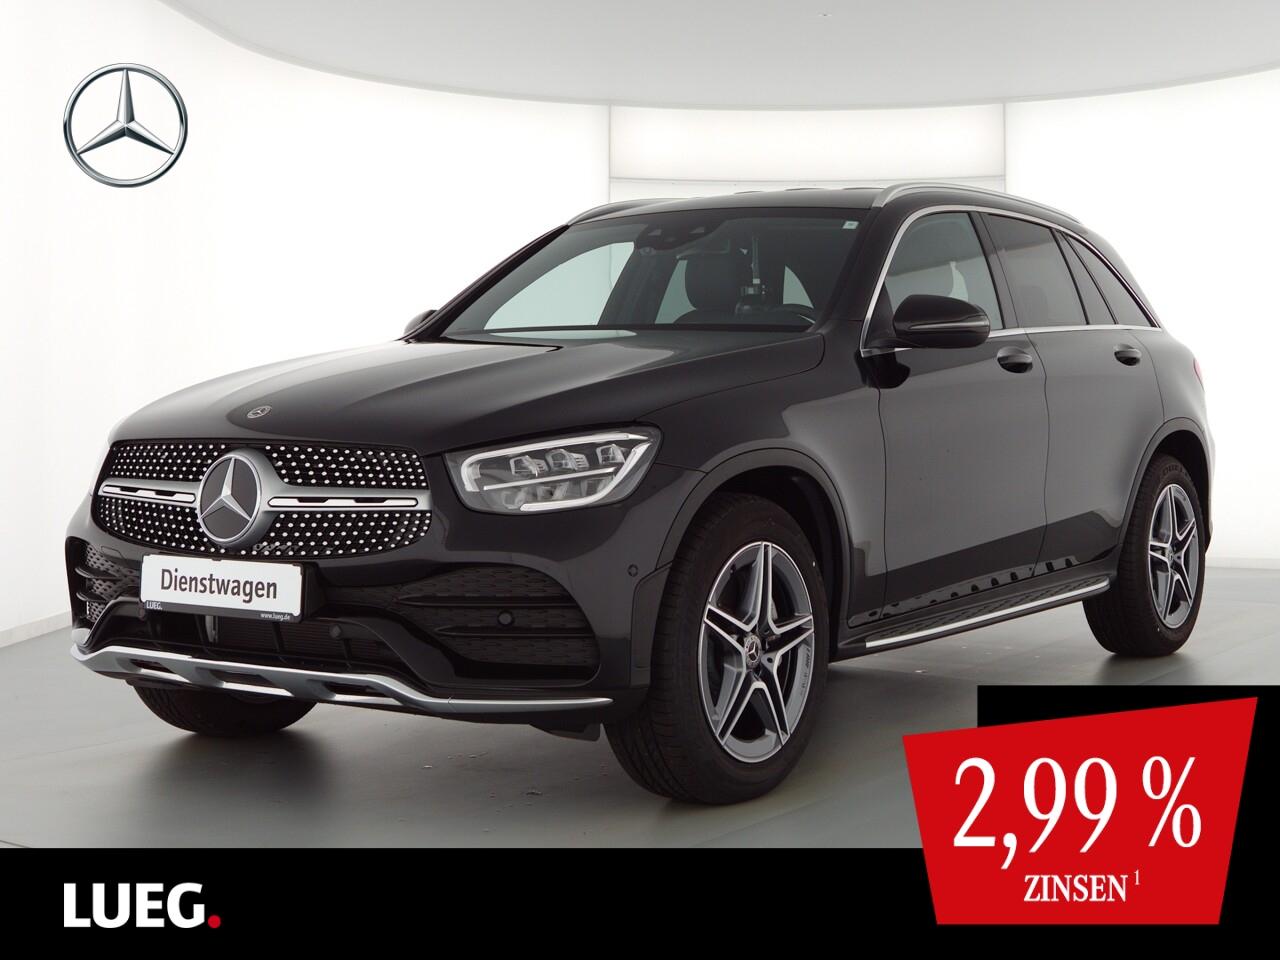 Mercedes-Benz GLC 200 d 4Matic AMG+LED+Kamera+PDC, Jahr, Diesel